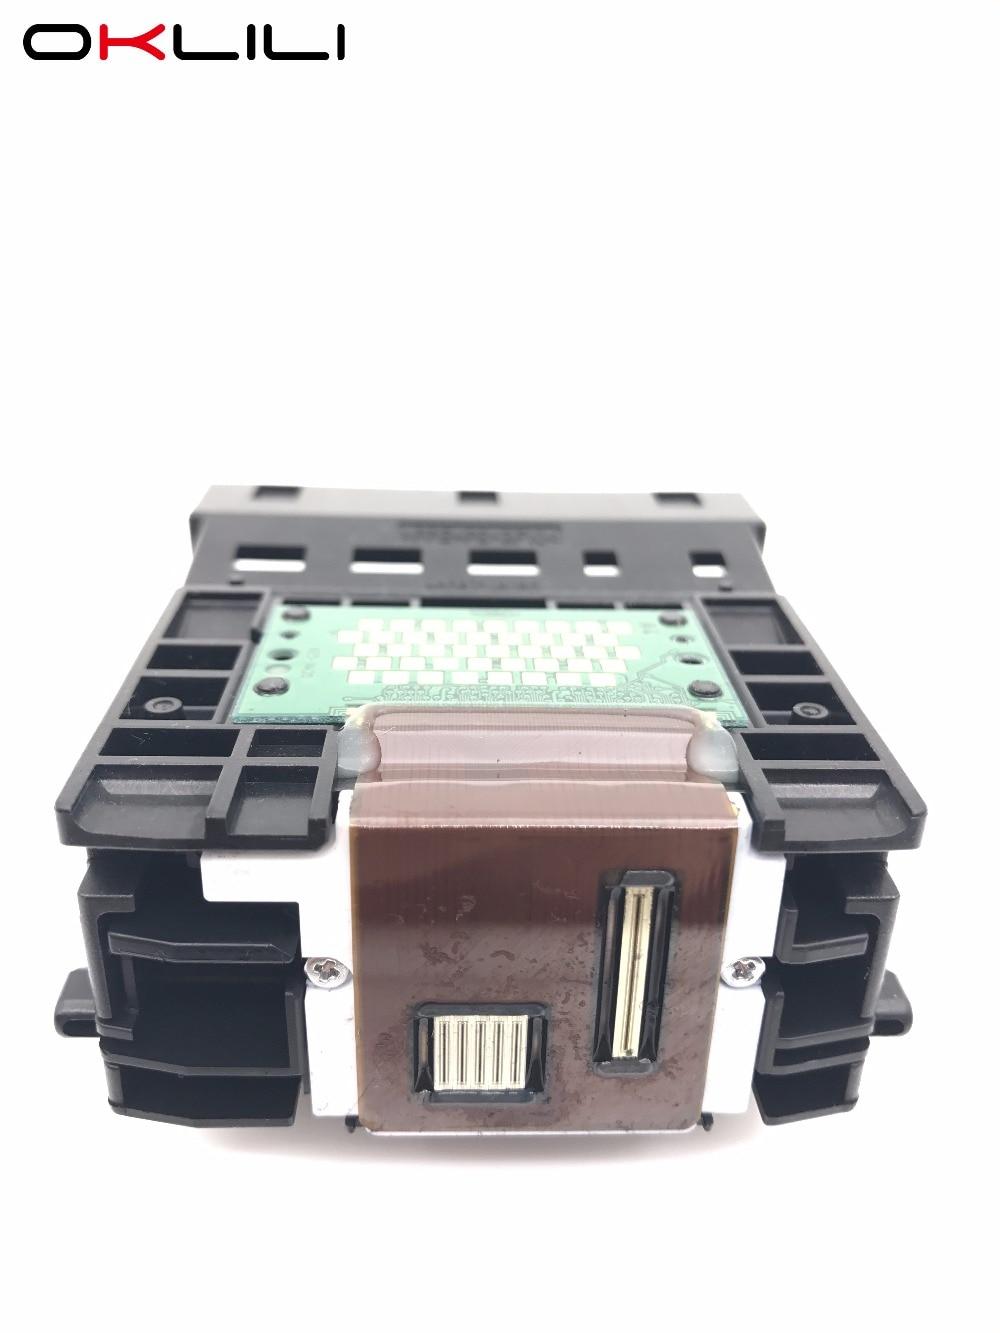 OKLILI QY6-0042 Printhead Print Head Printer Head for Canon iX4000 iX5000 iP3100 iP3000 560i 850i MP700 MP710 MP730 MP740 oklili qy6 0080 printhead printer print head for canon ip4820 ip4850 ix6520 ix6550 mx715 mx885 mg5220 mg5250 mg5320 mg5350